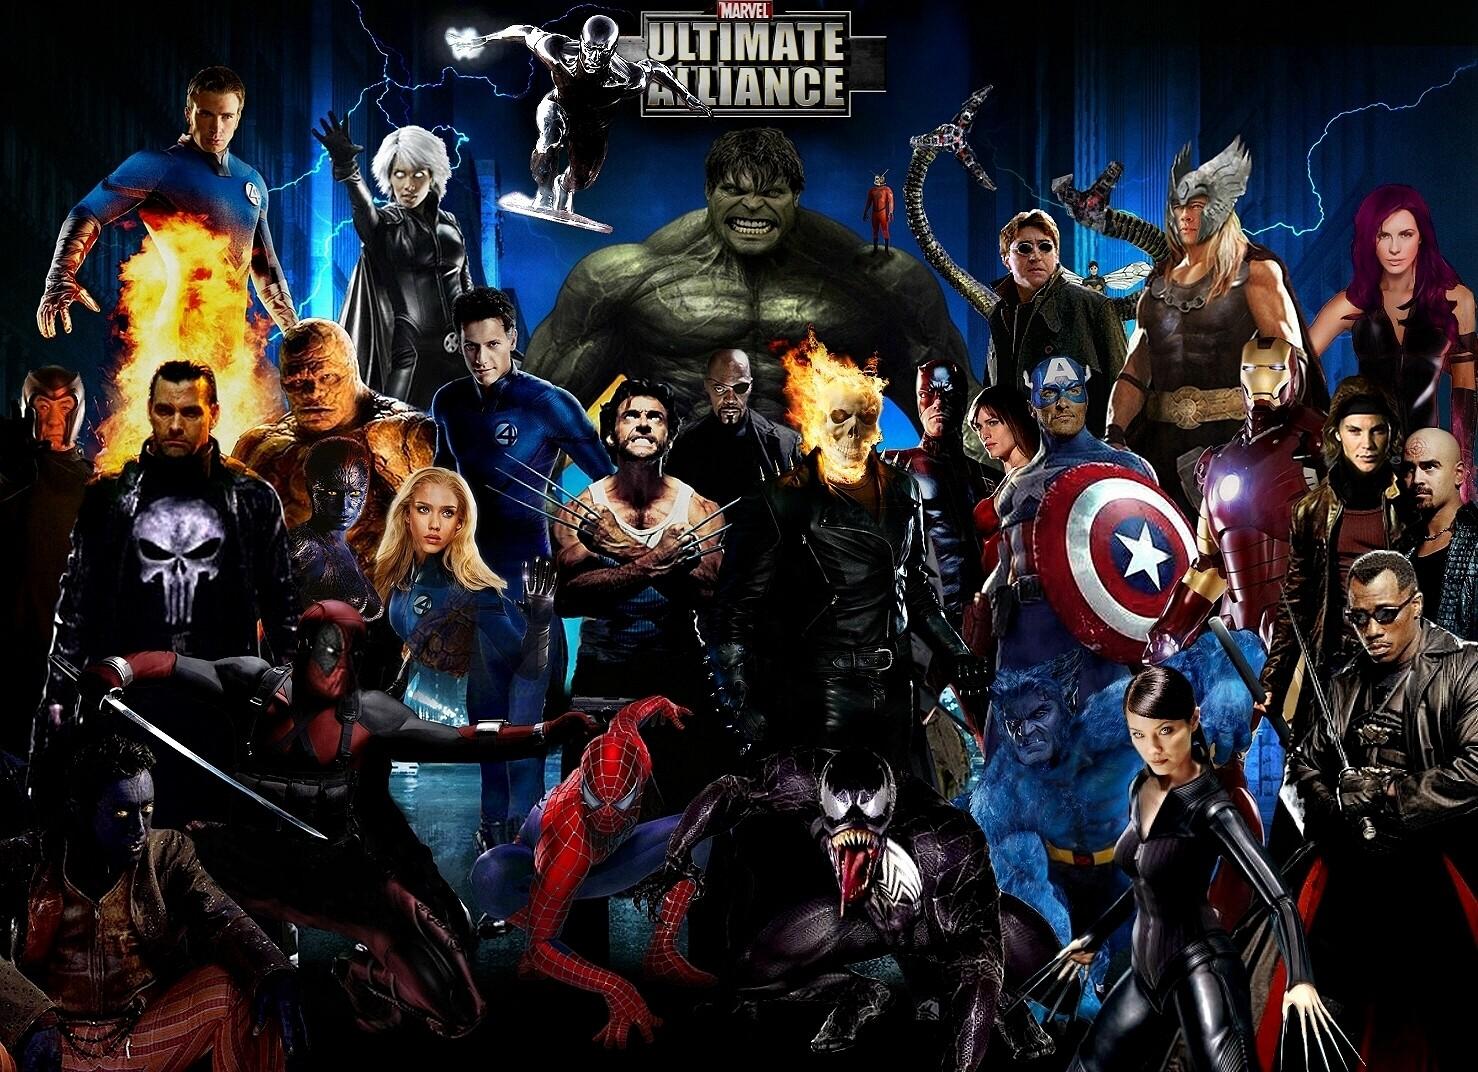 wallpaper alliance ultimate - photo #4